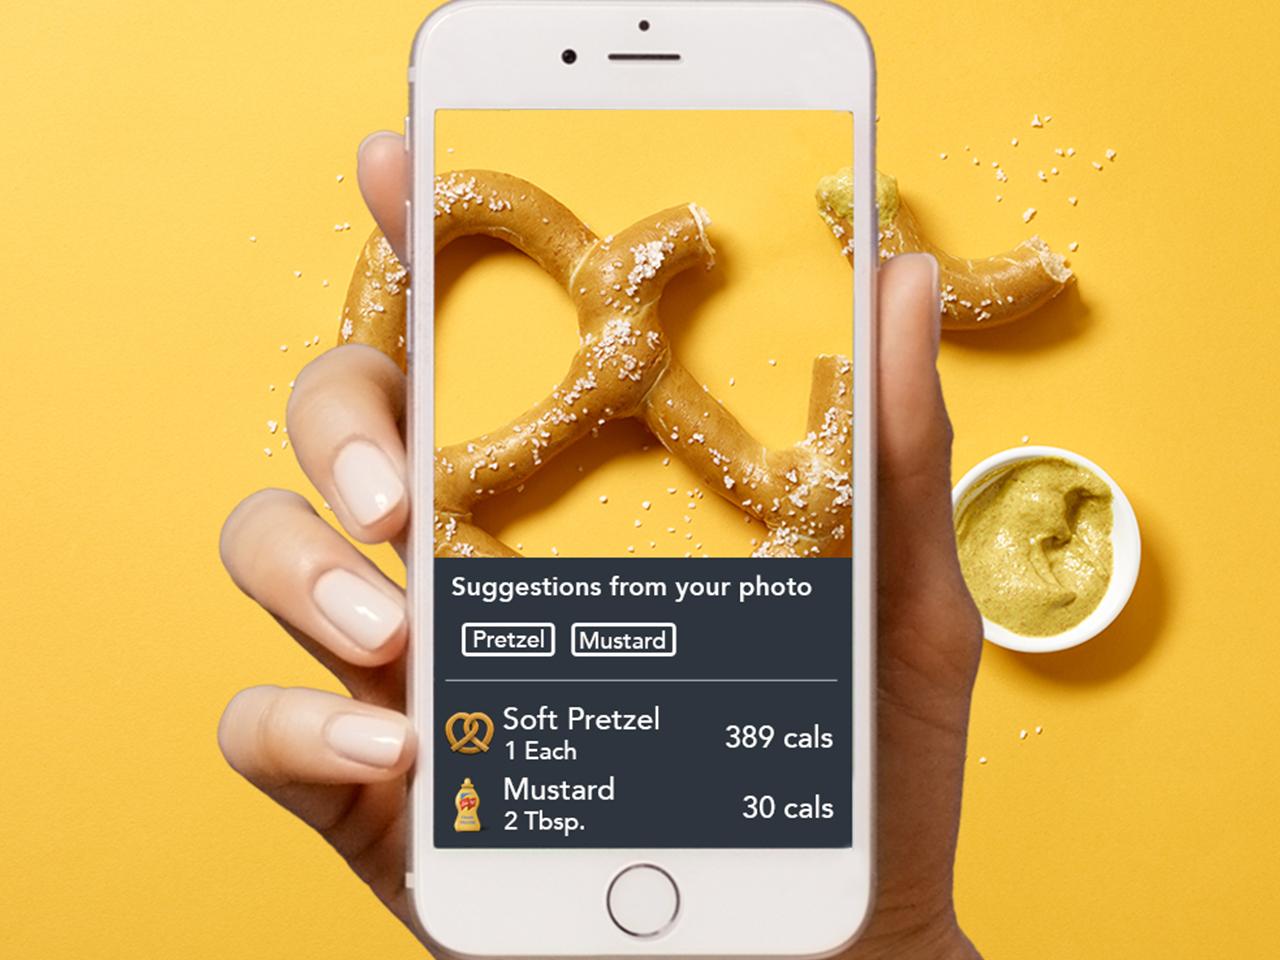 Loseit app, diet, healthy eating